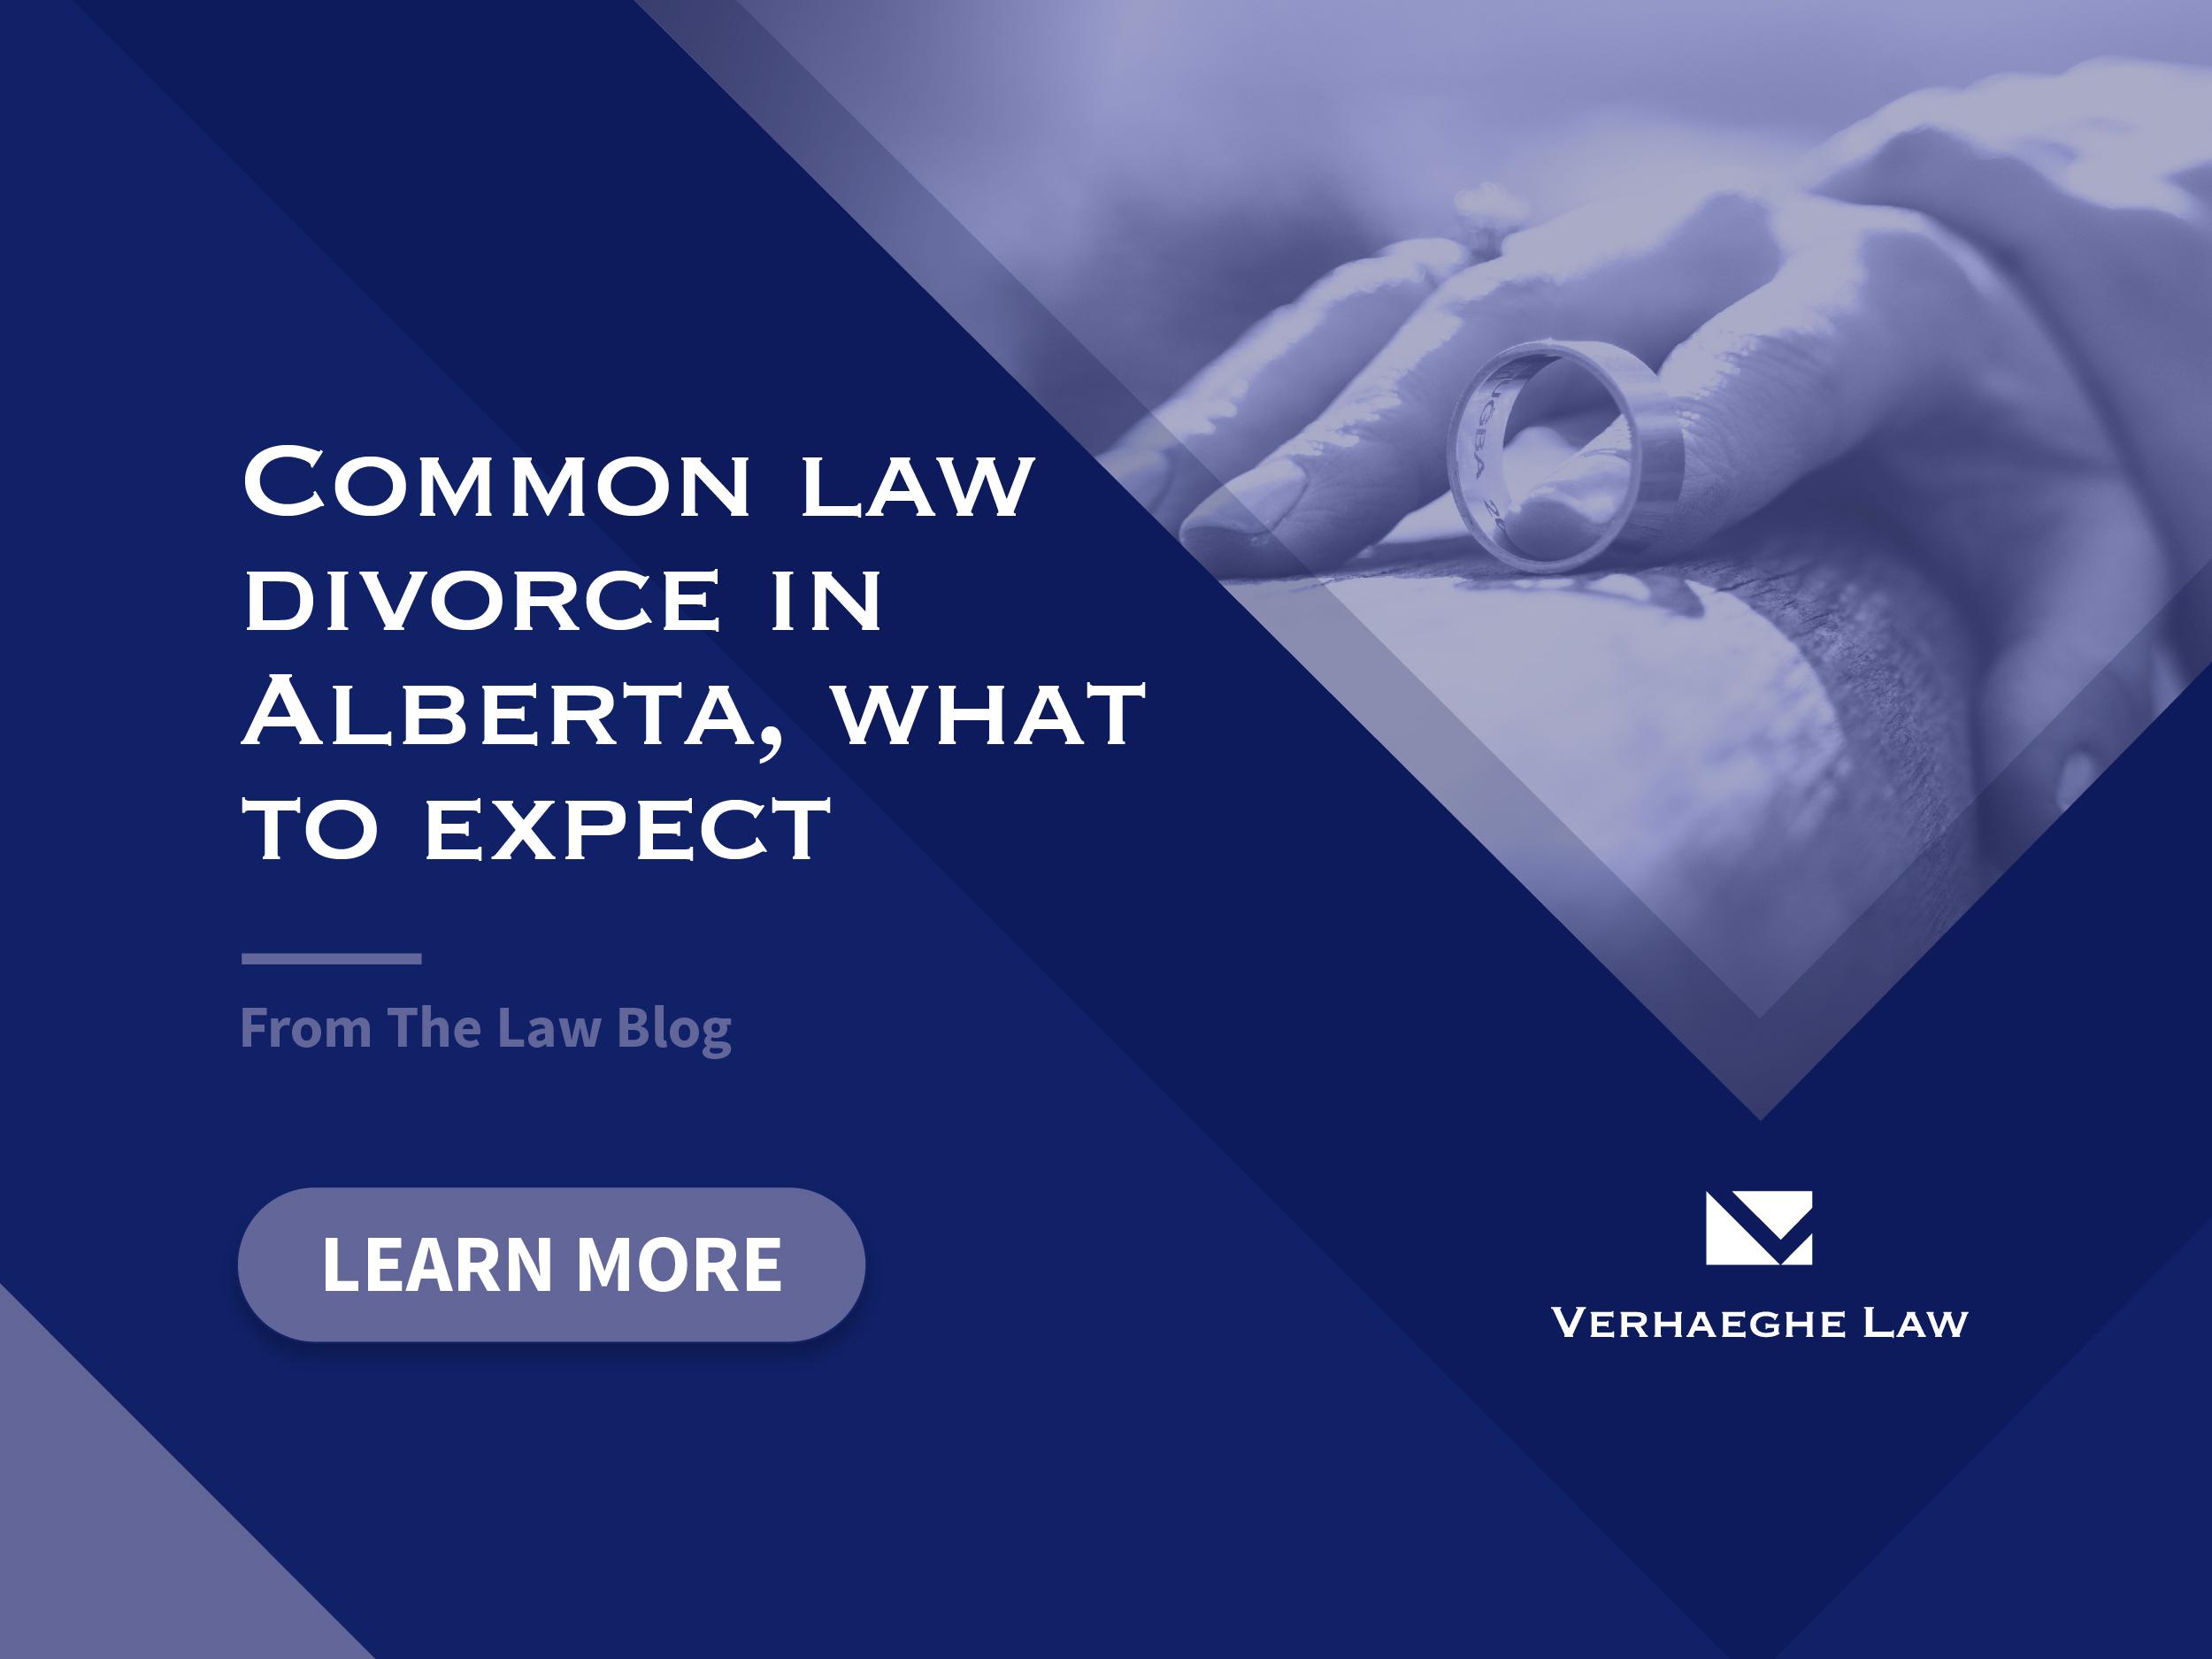 Common Law Divorce In Alberta